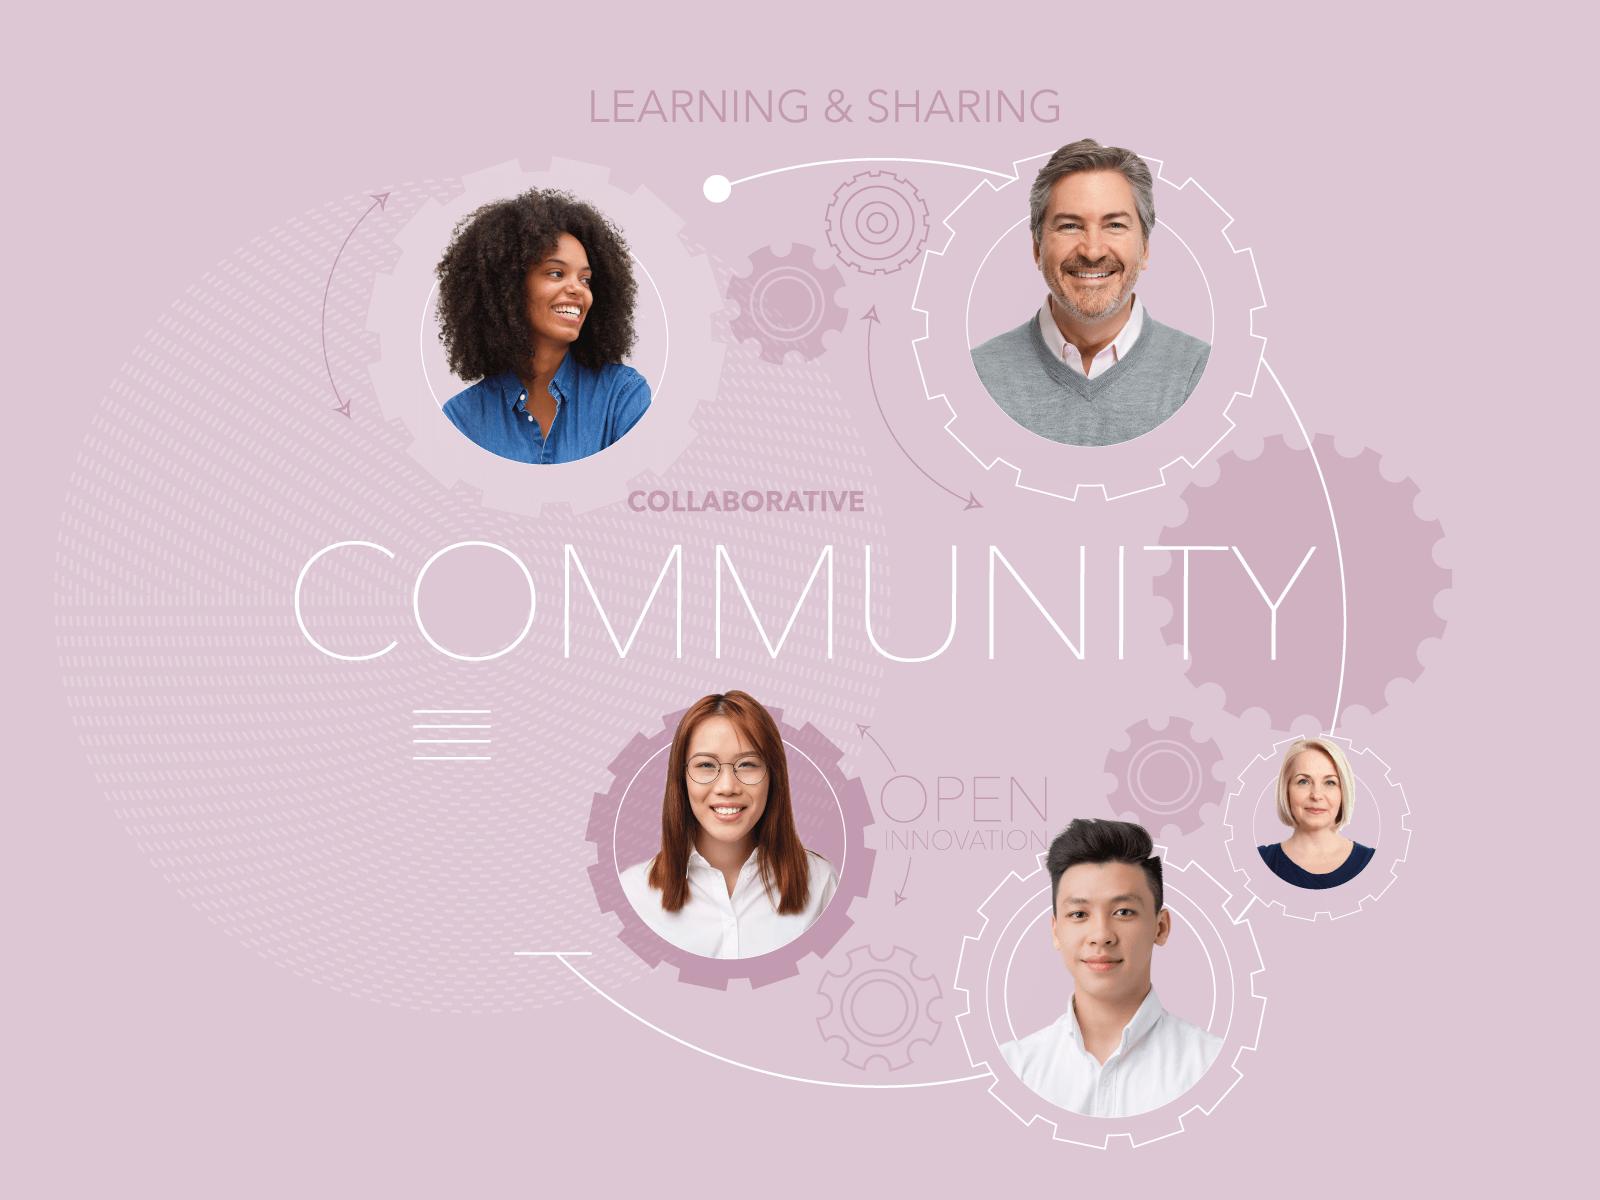 Principle 3 - community